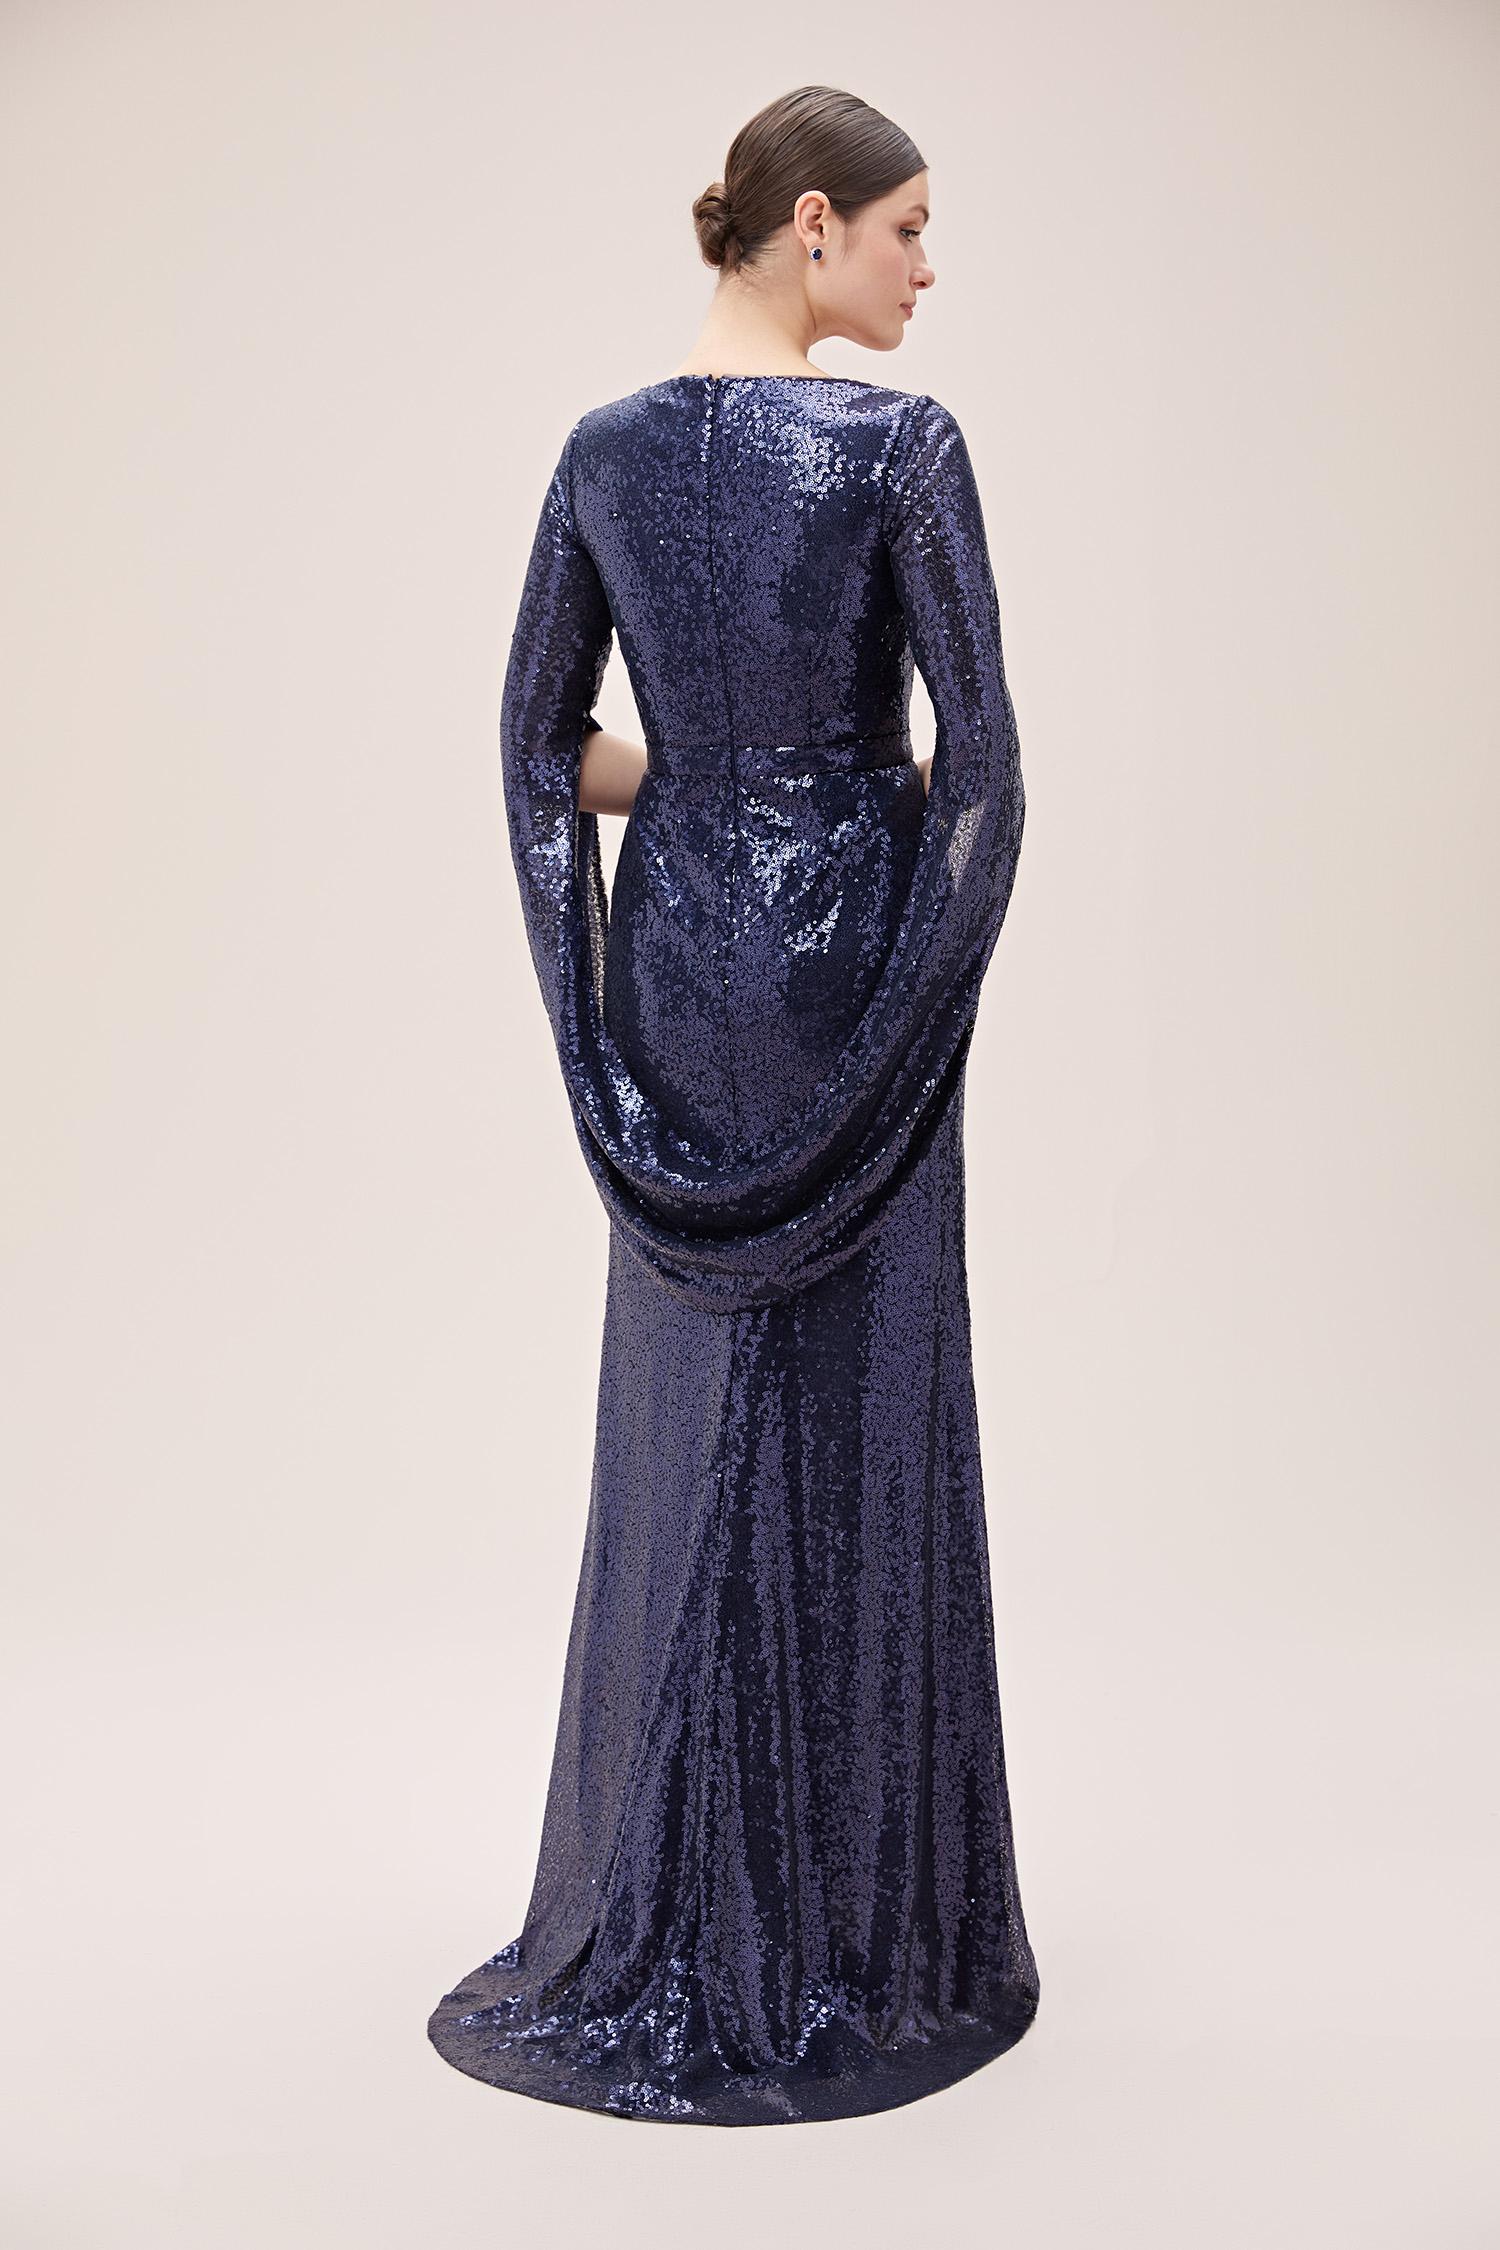 Lacivert Payet İşlemeli V Yaka Uzun Abiye Elbise - Thumbnail